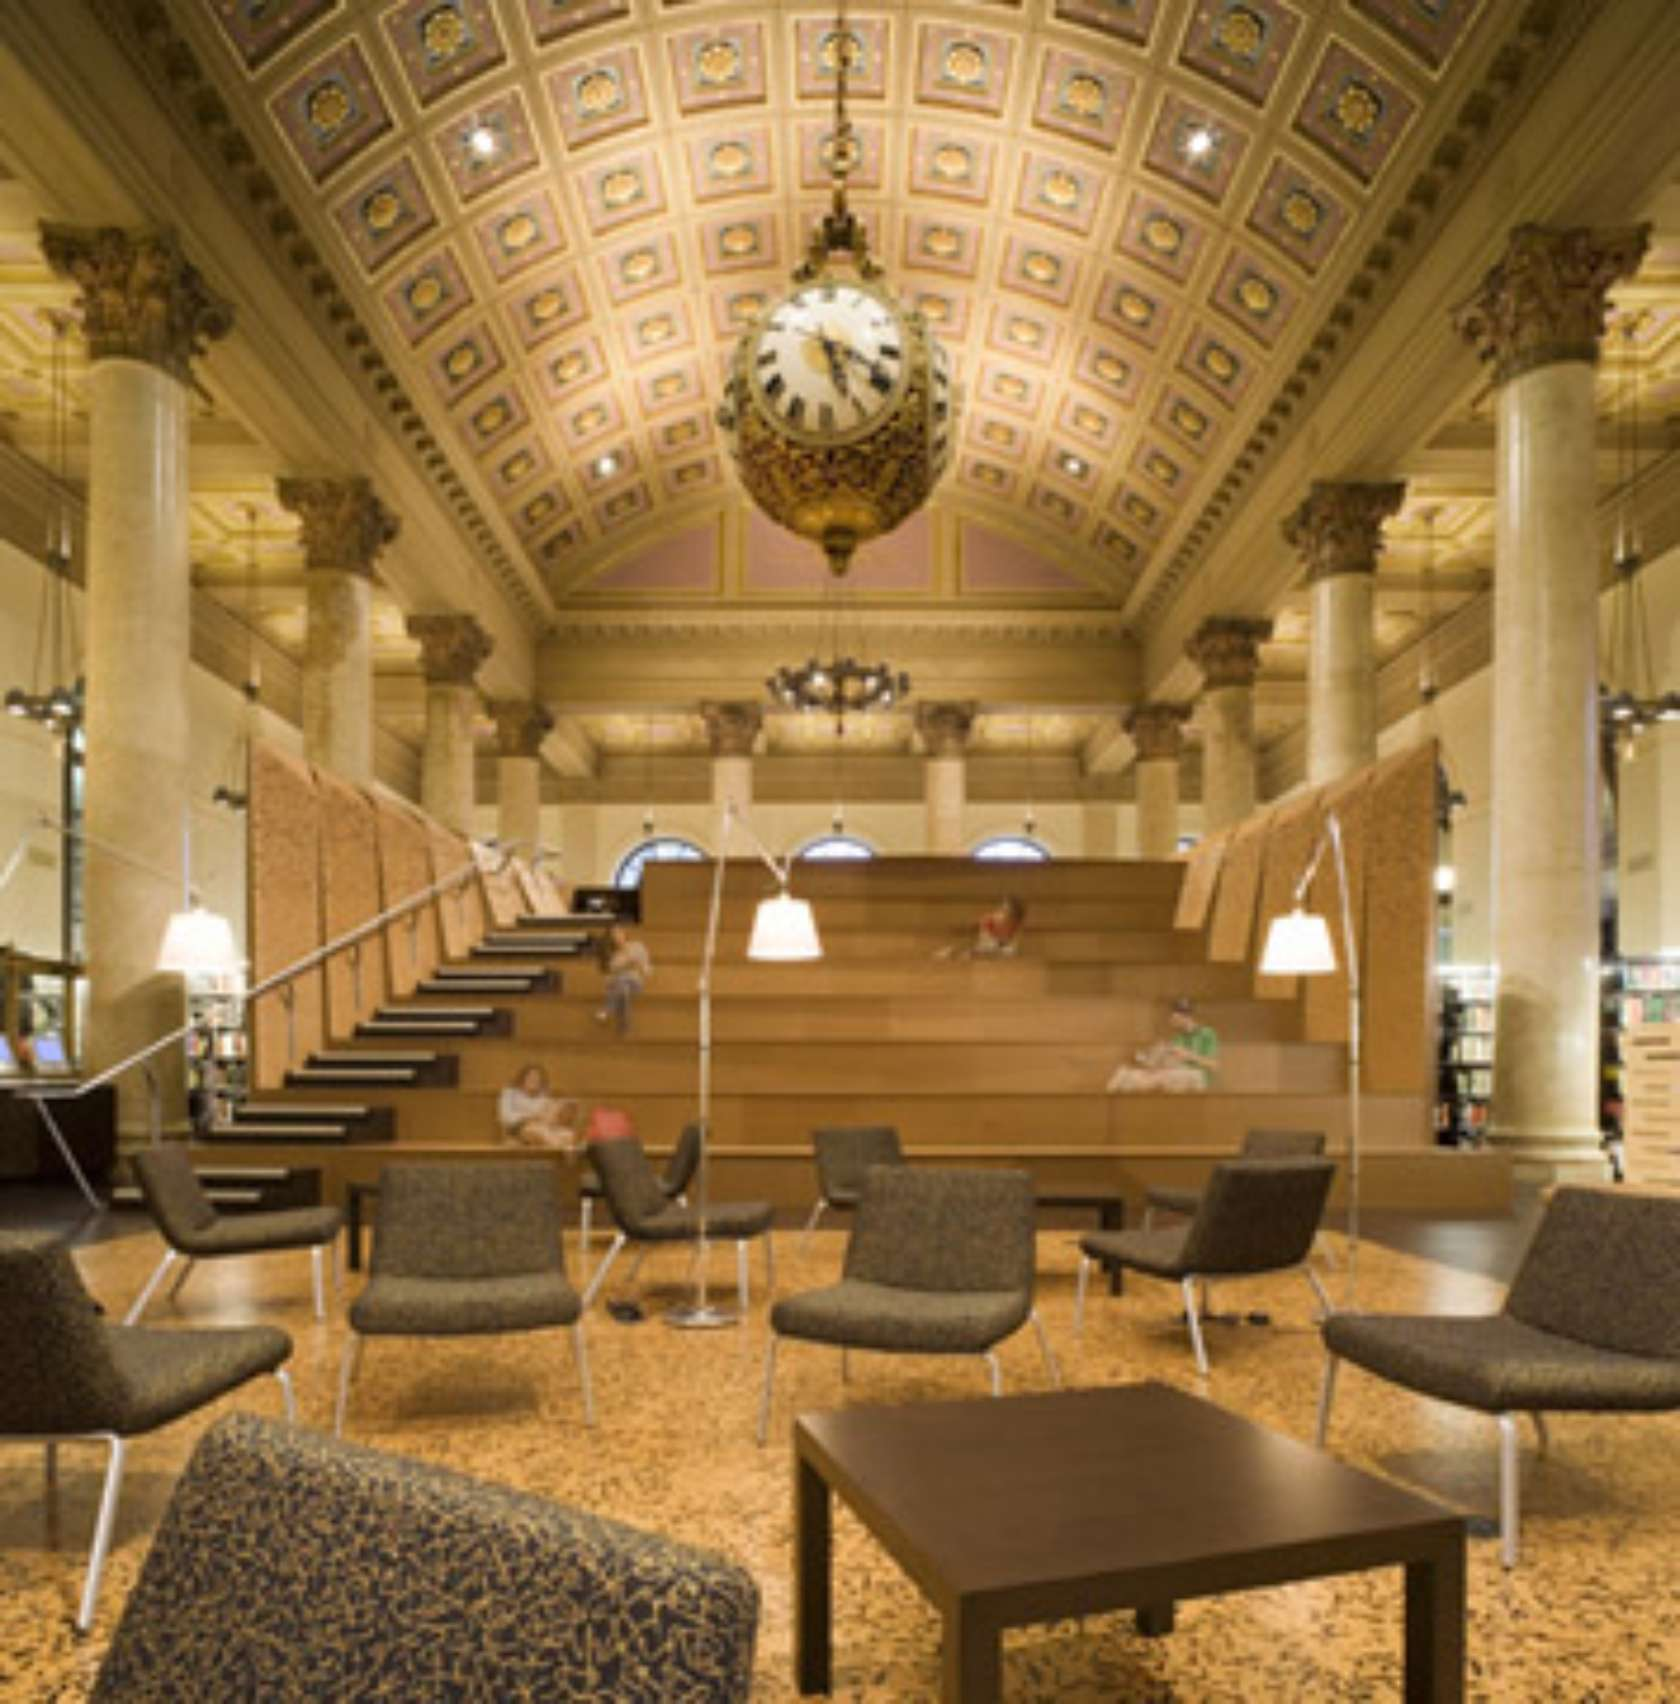 Rhode island school of design library architizer for Interior decorator rhode island